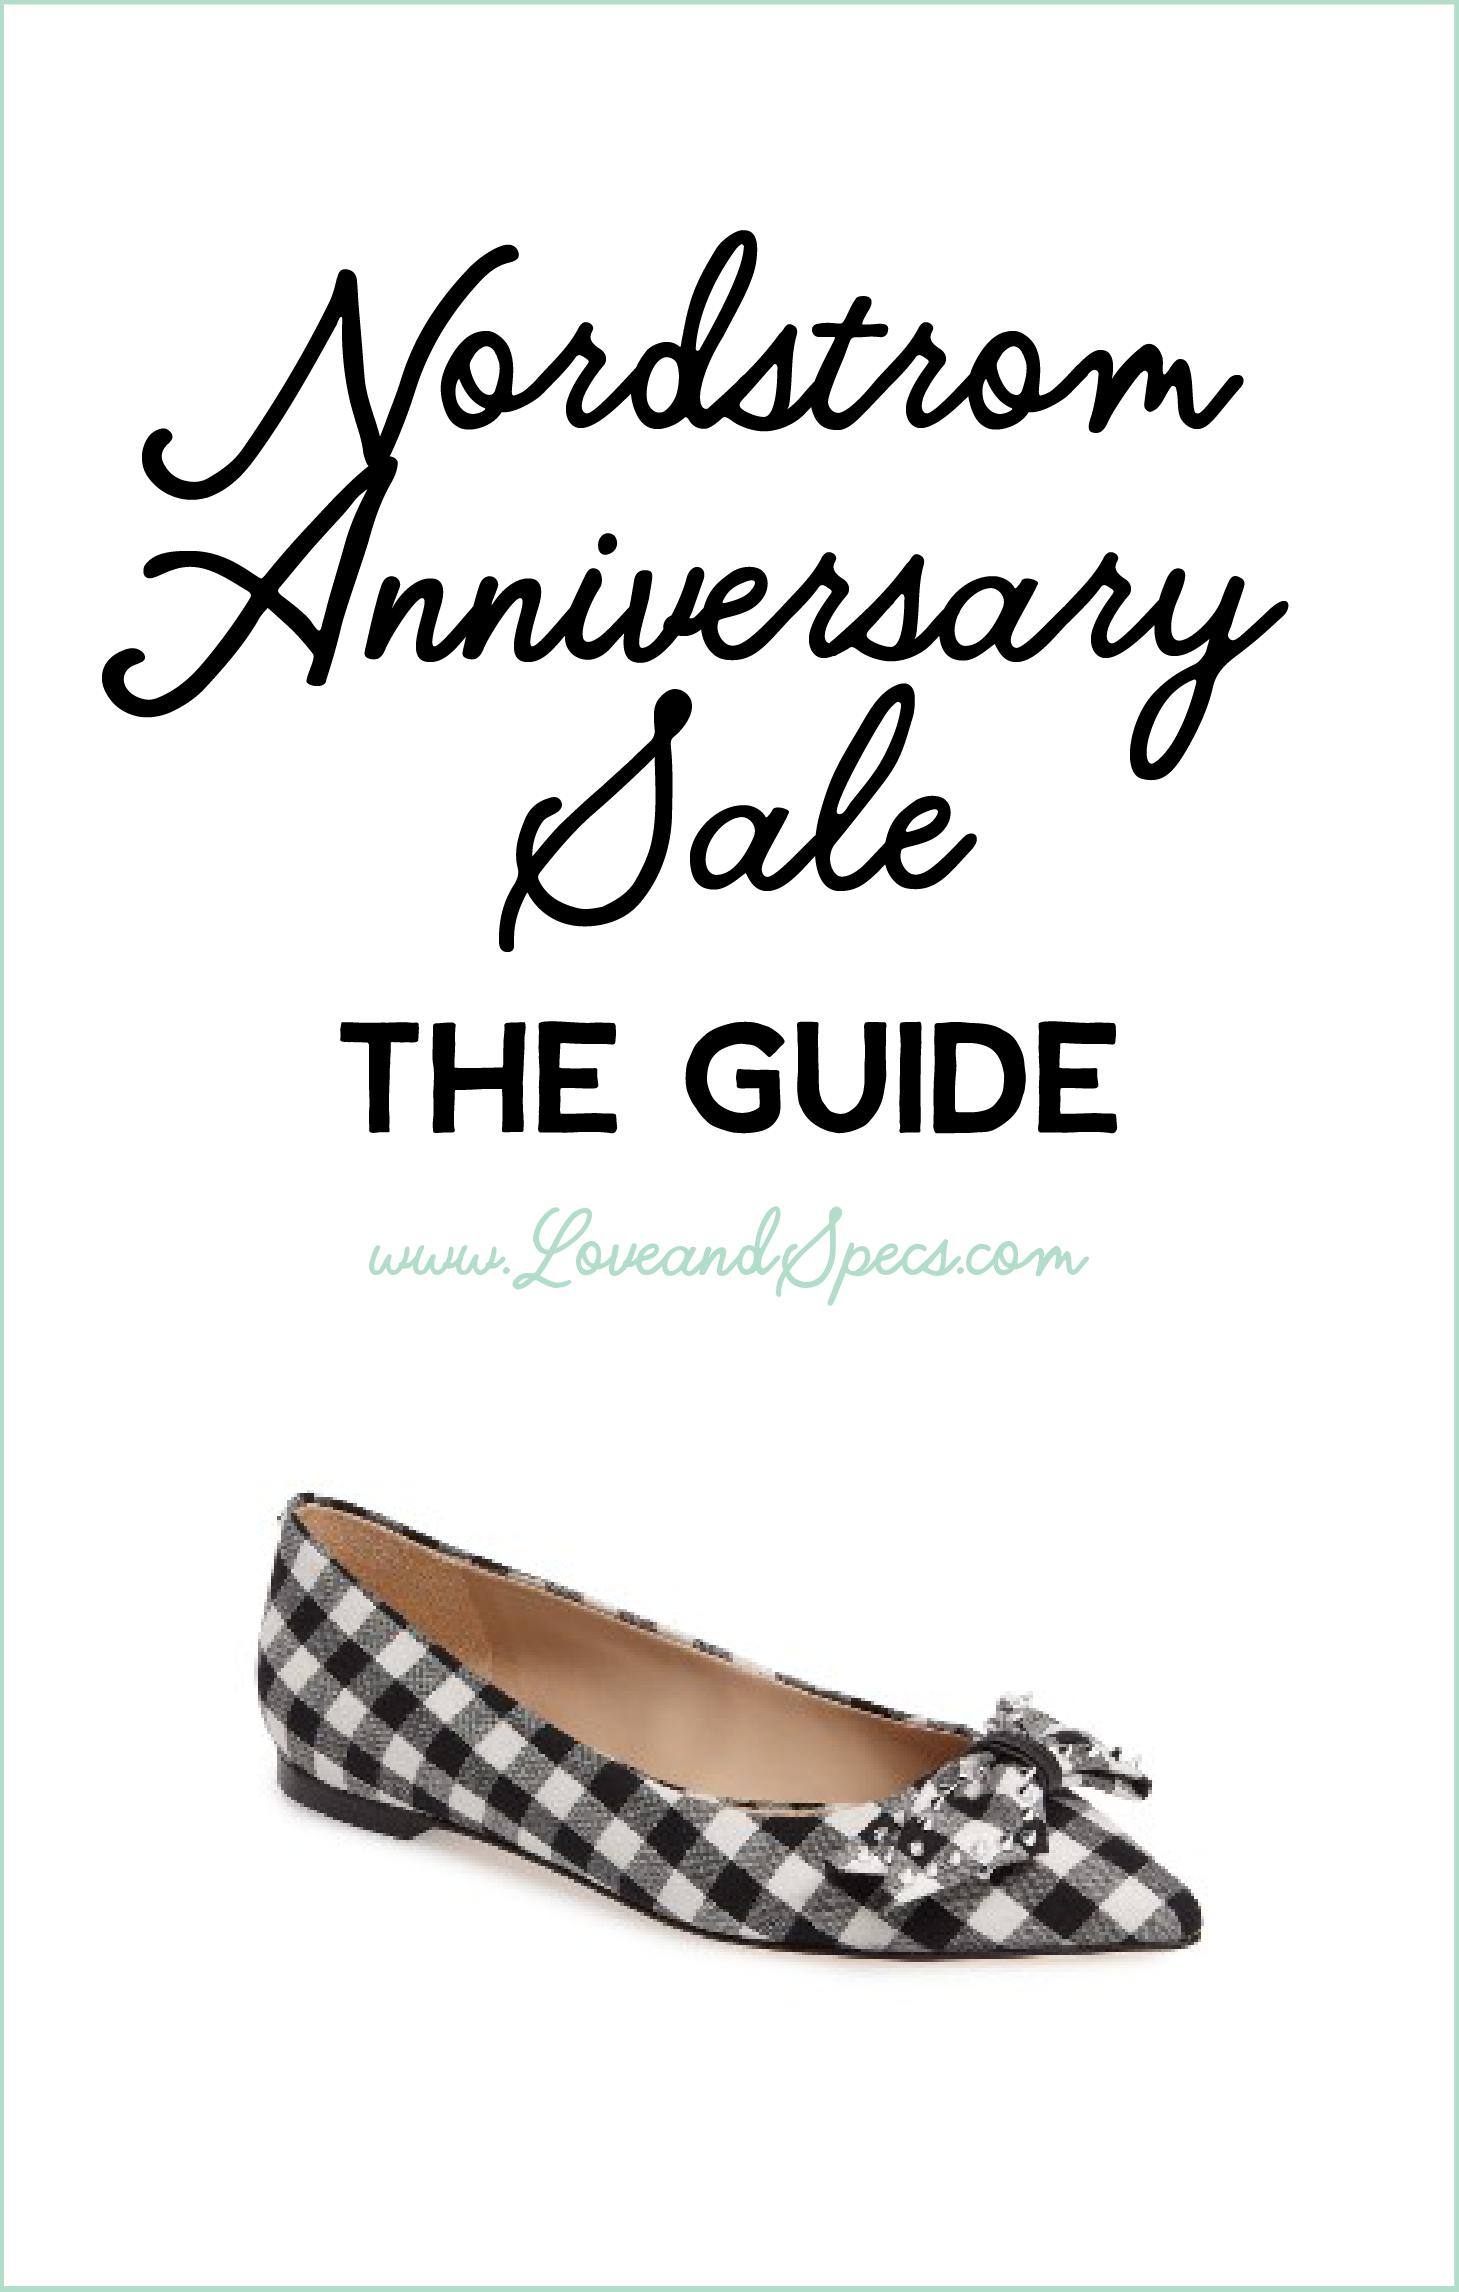 Nordstrom-Anniversary-Sale.jpeg